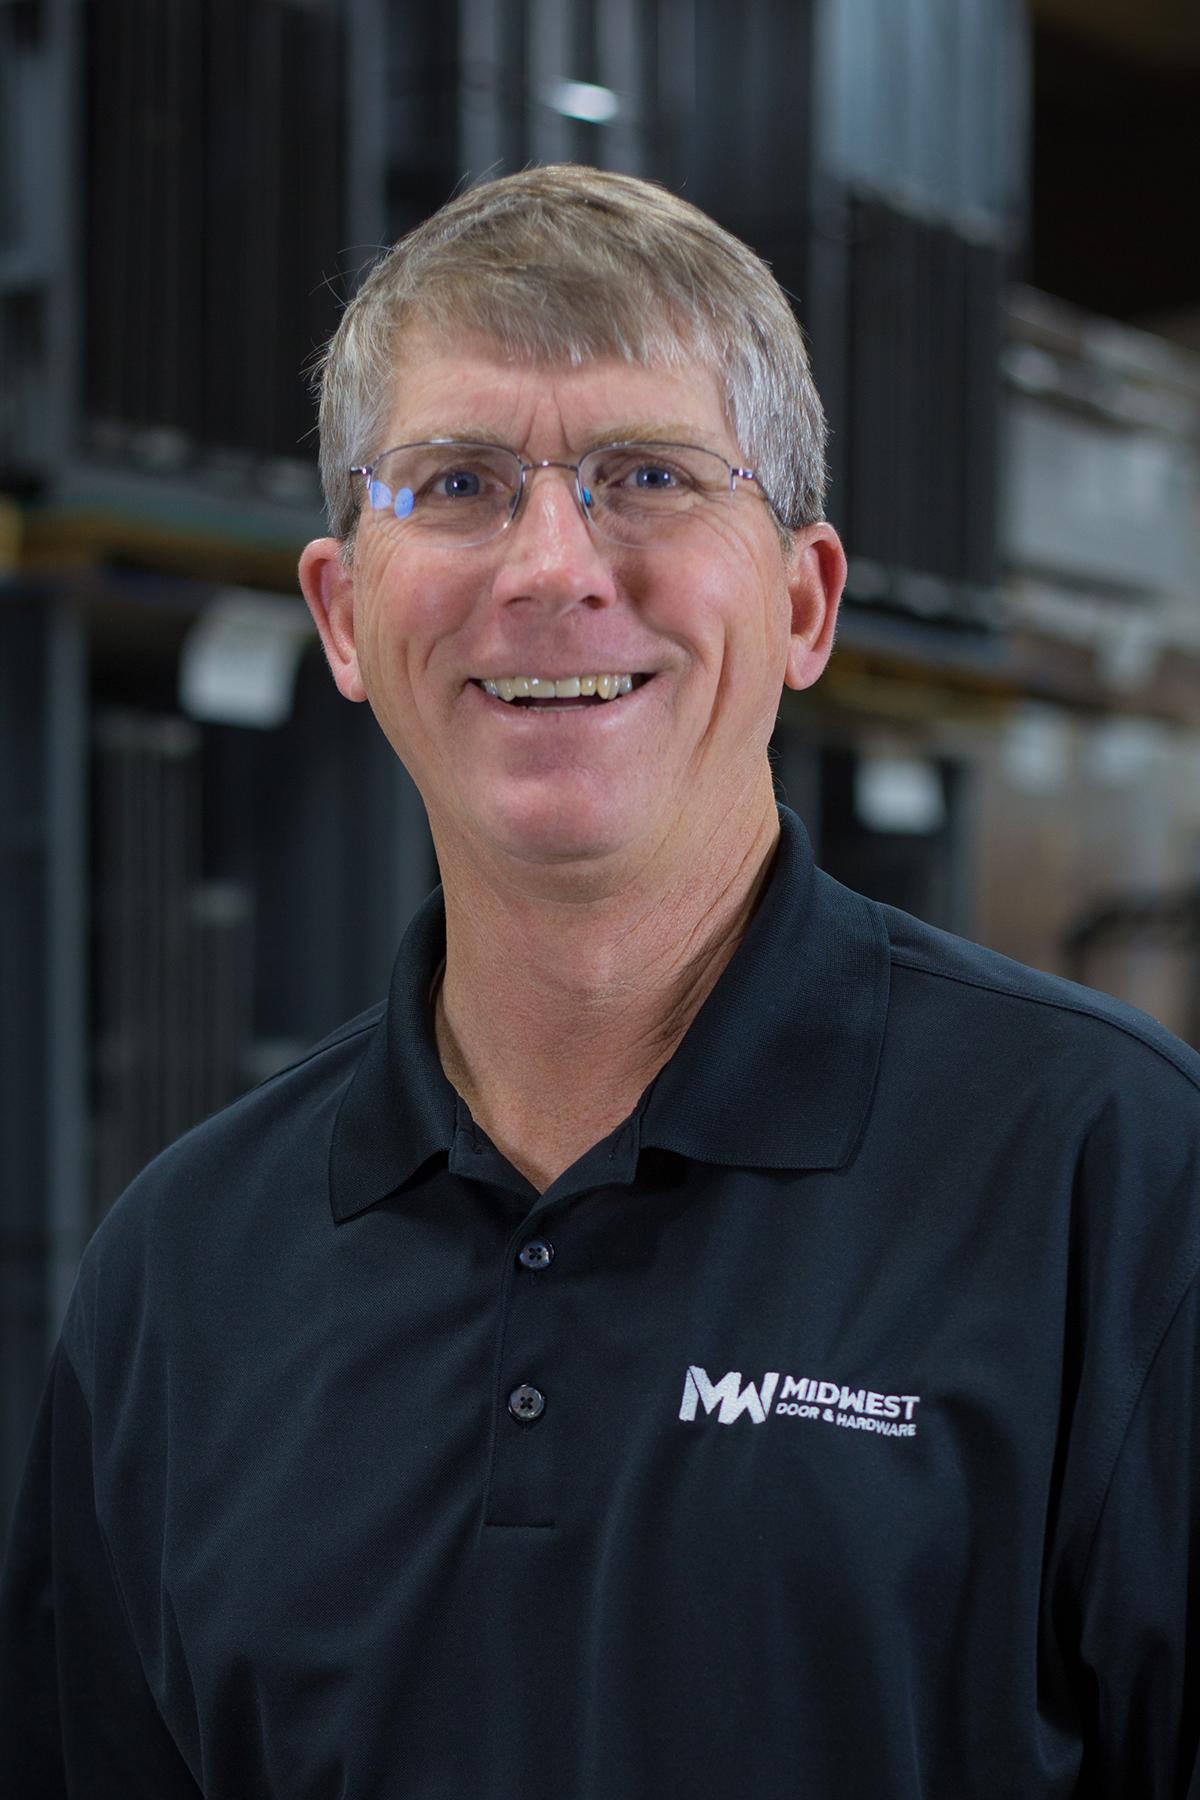 Mike Halverson